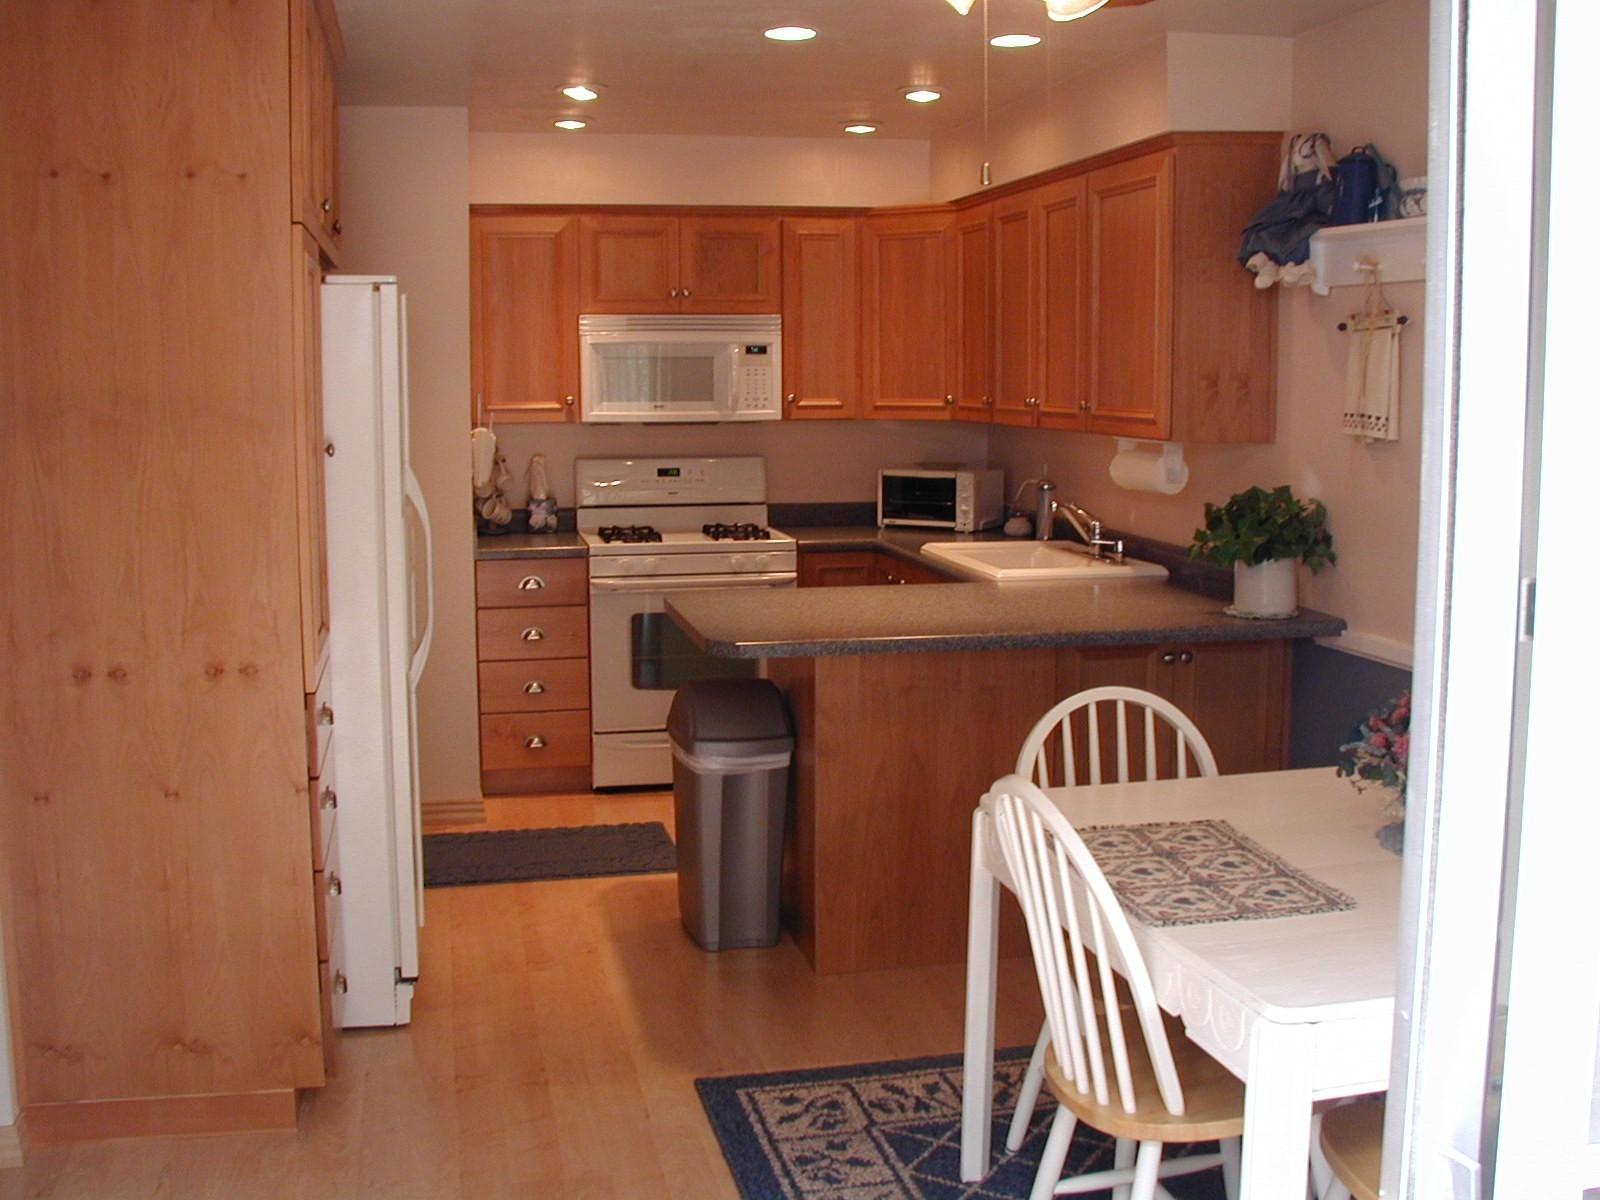 Lighting in kitchen with no island? (floor, paneling ...